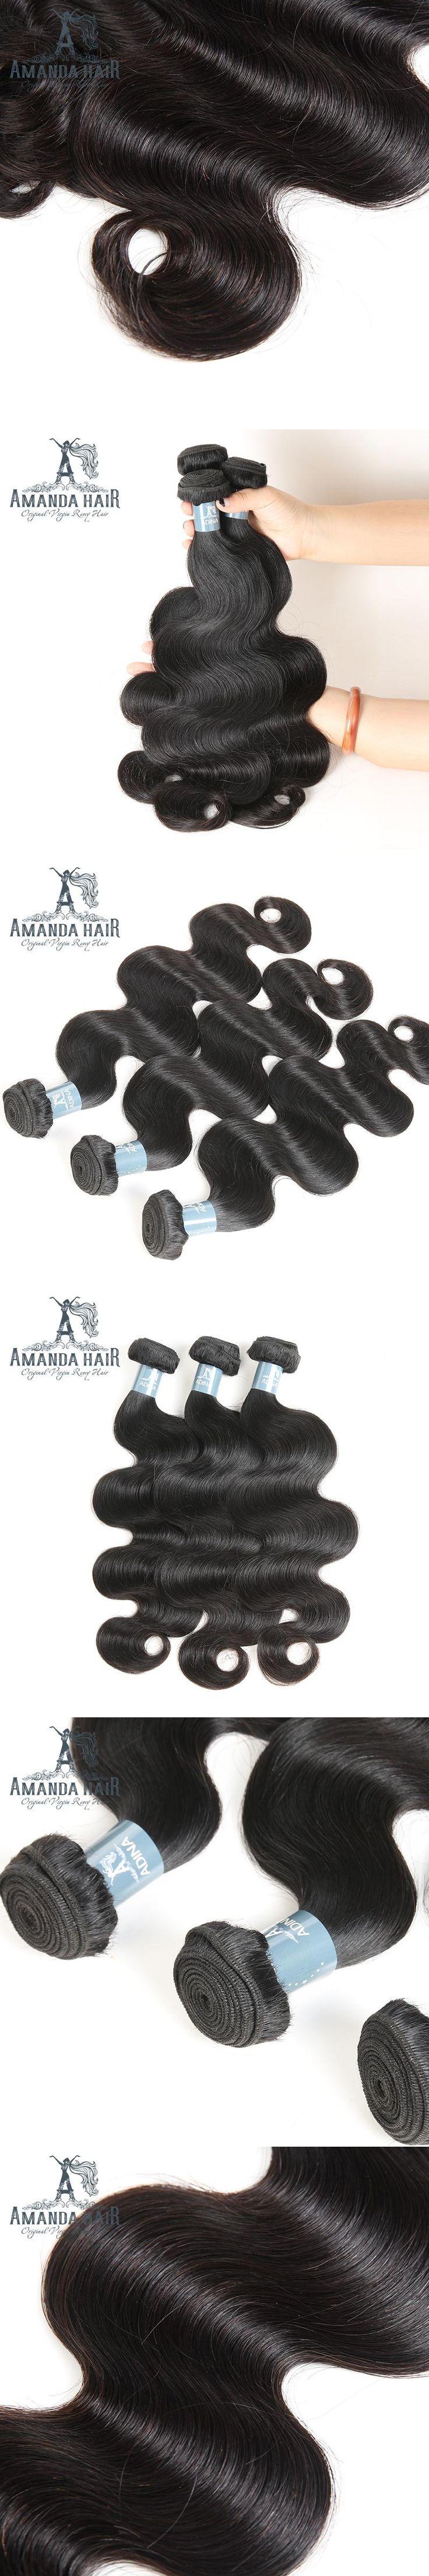 Human Hair Bundles Brazilian Body Wave Hair Weave High Ratio Longest Hair For Salon 10-28 Inch Unprocessed Virgin Hair Extension